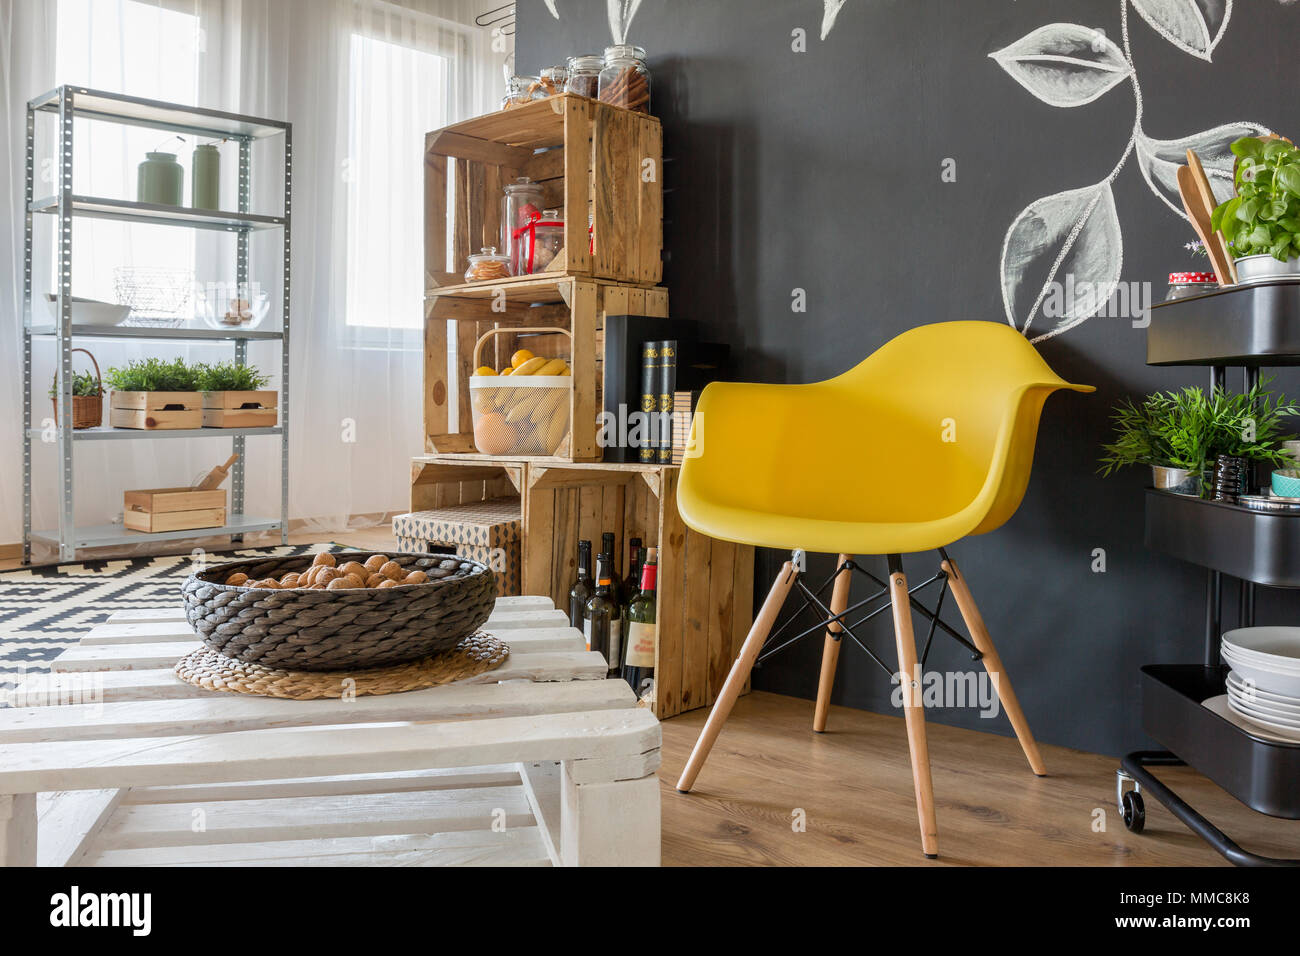 stuhl aus paletten perfect material zum bau des with stuhl aus paletten free origineller. Black Bedroom Furniture Sets. Home Design Ideas